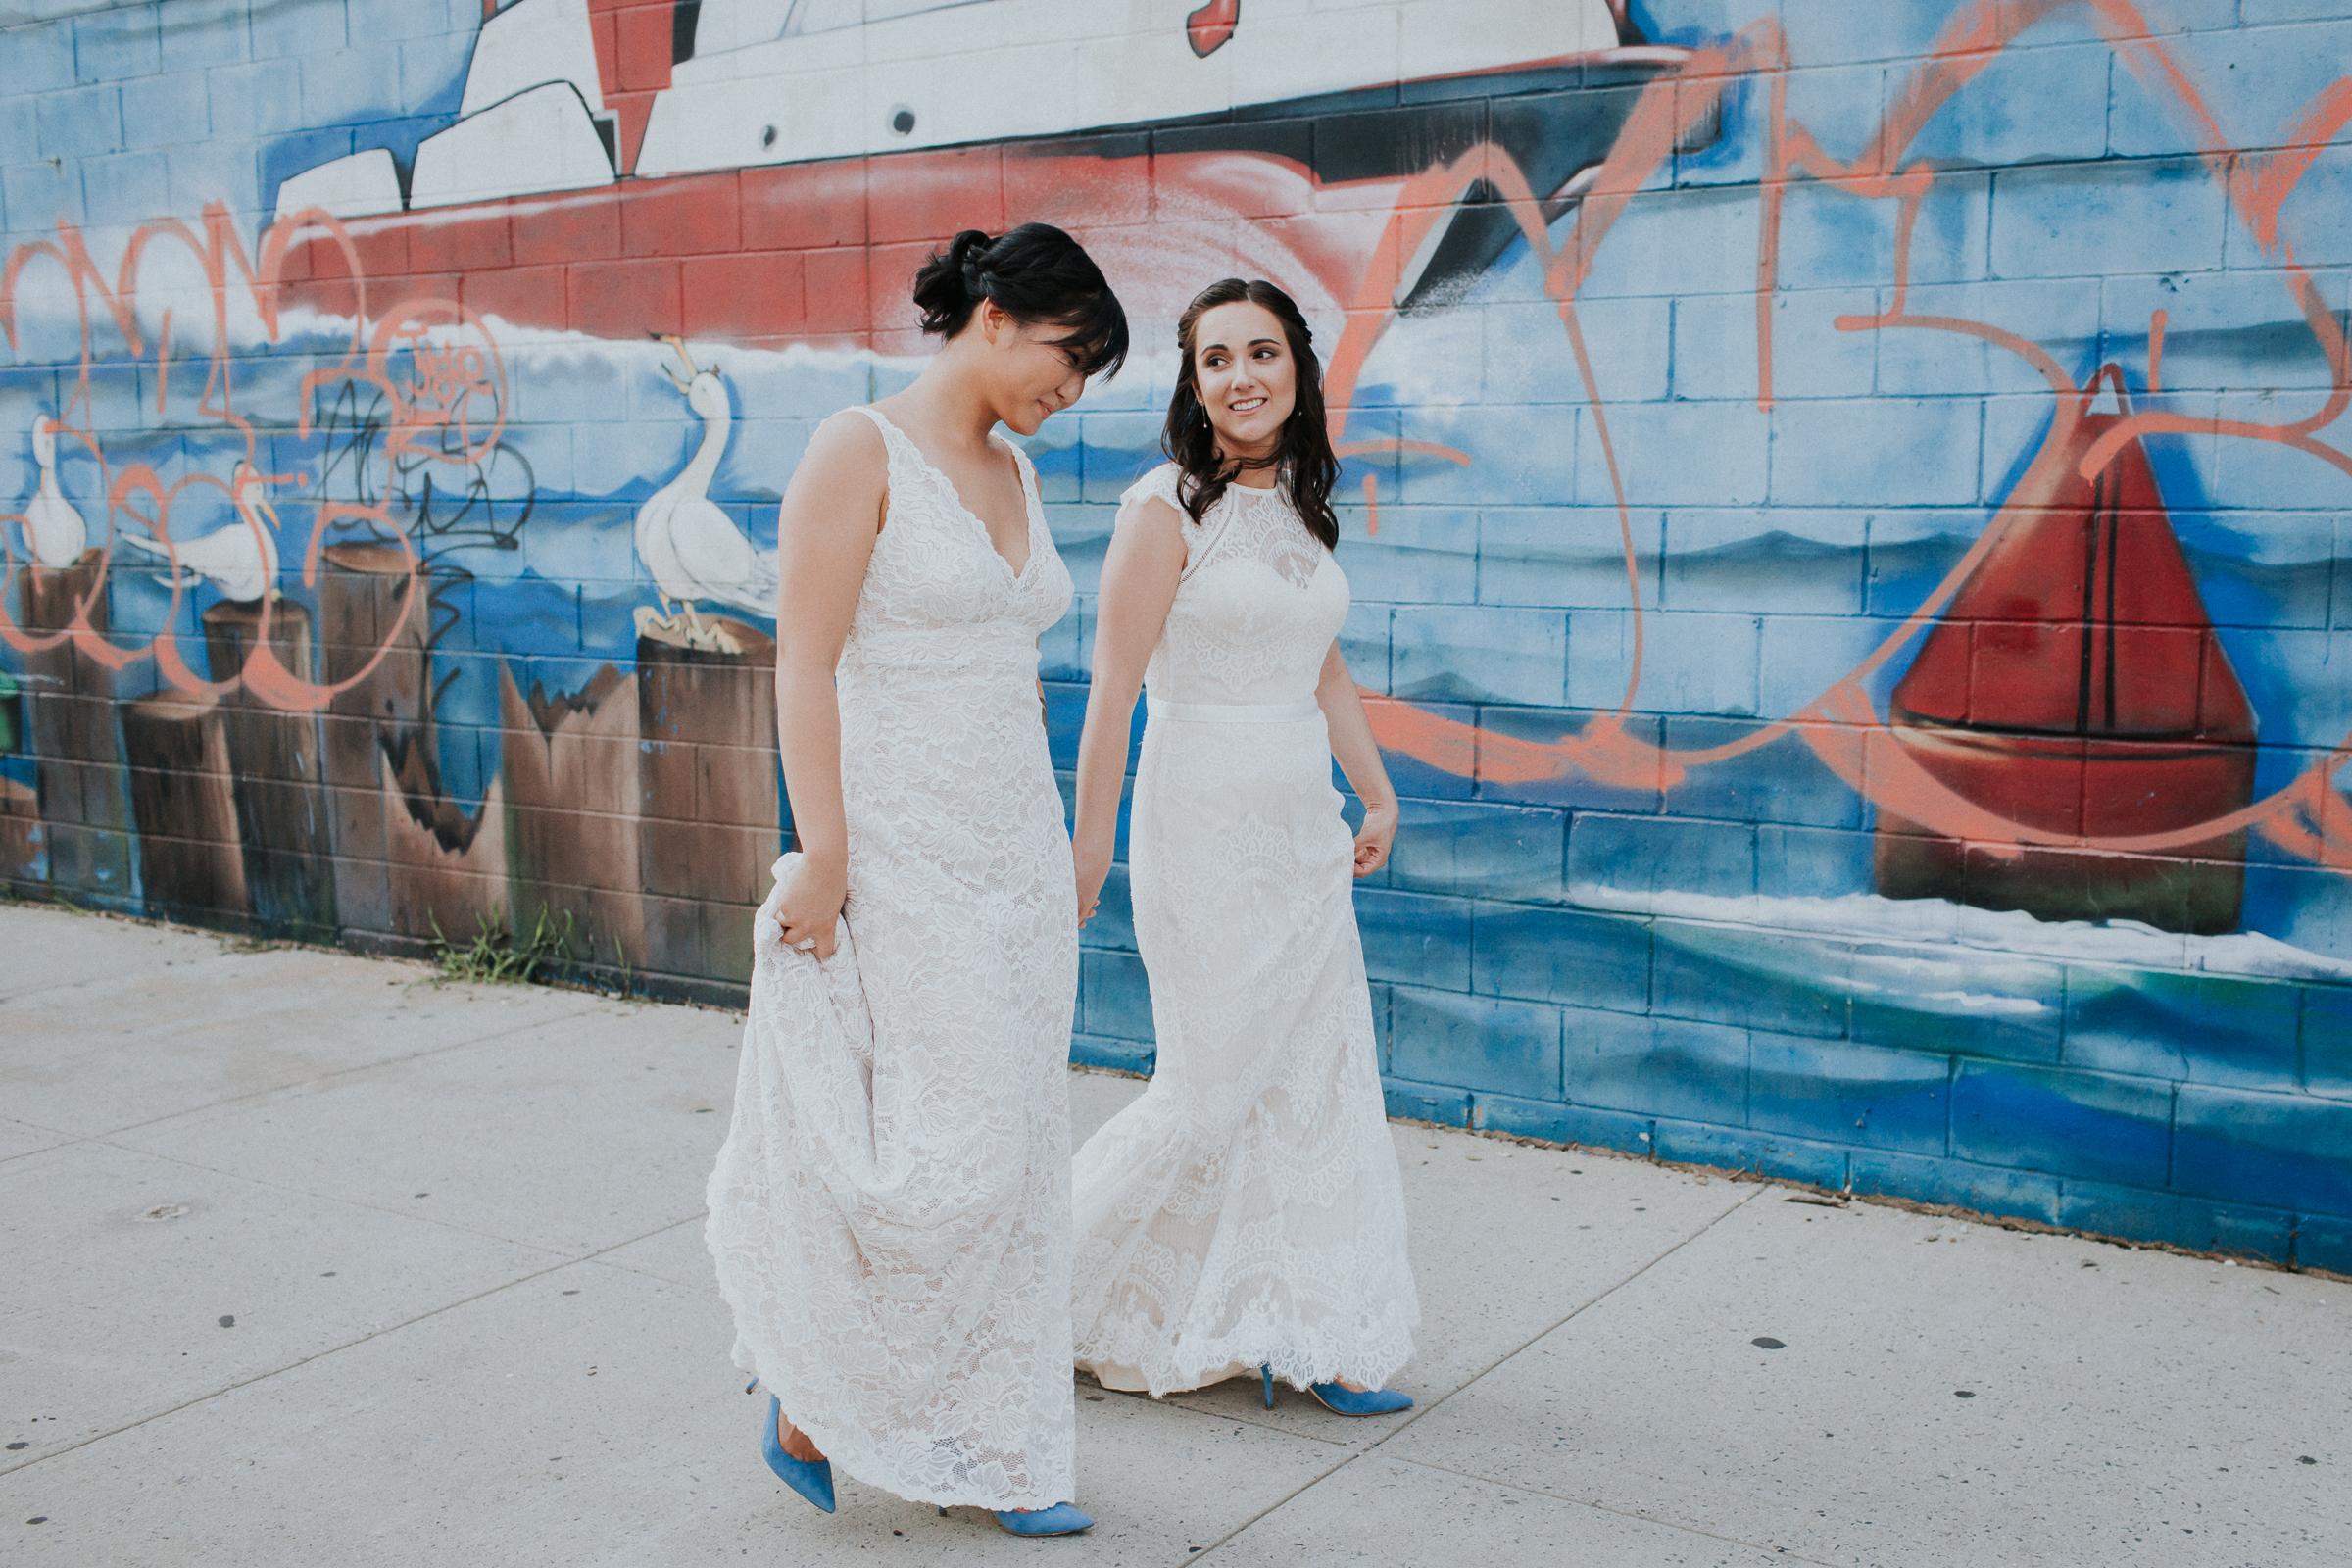 My-Moon-Brooklyn-LGBT-Gay-Documentary-Wedding-Photographer-38.jpg